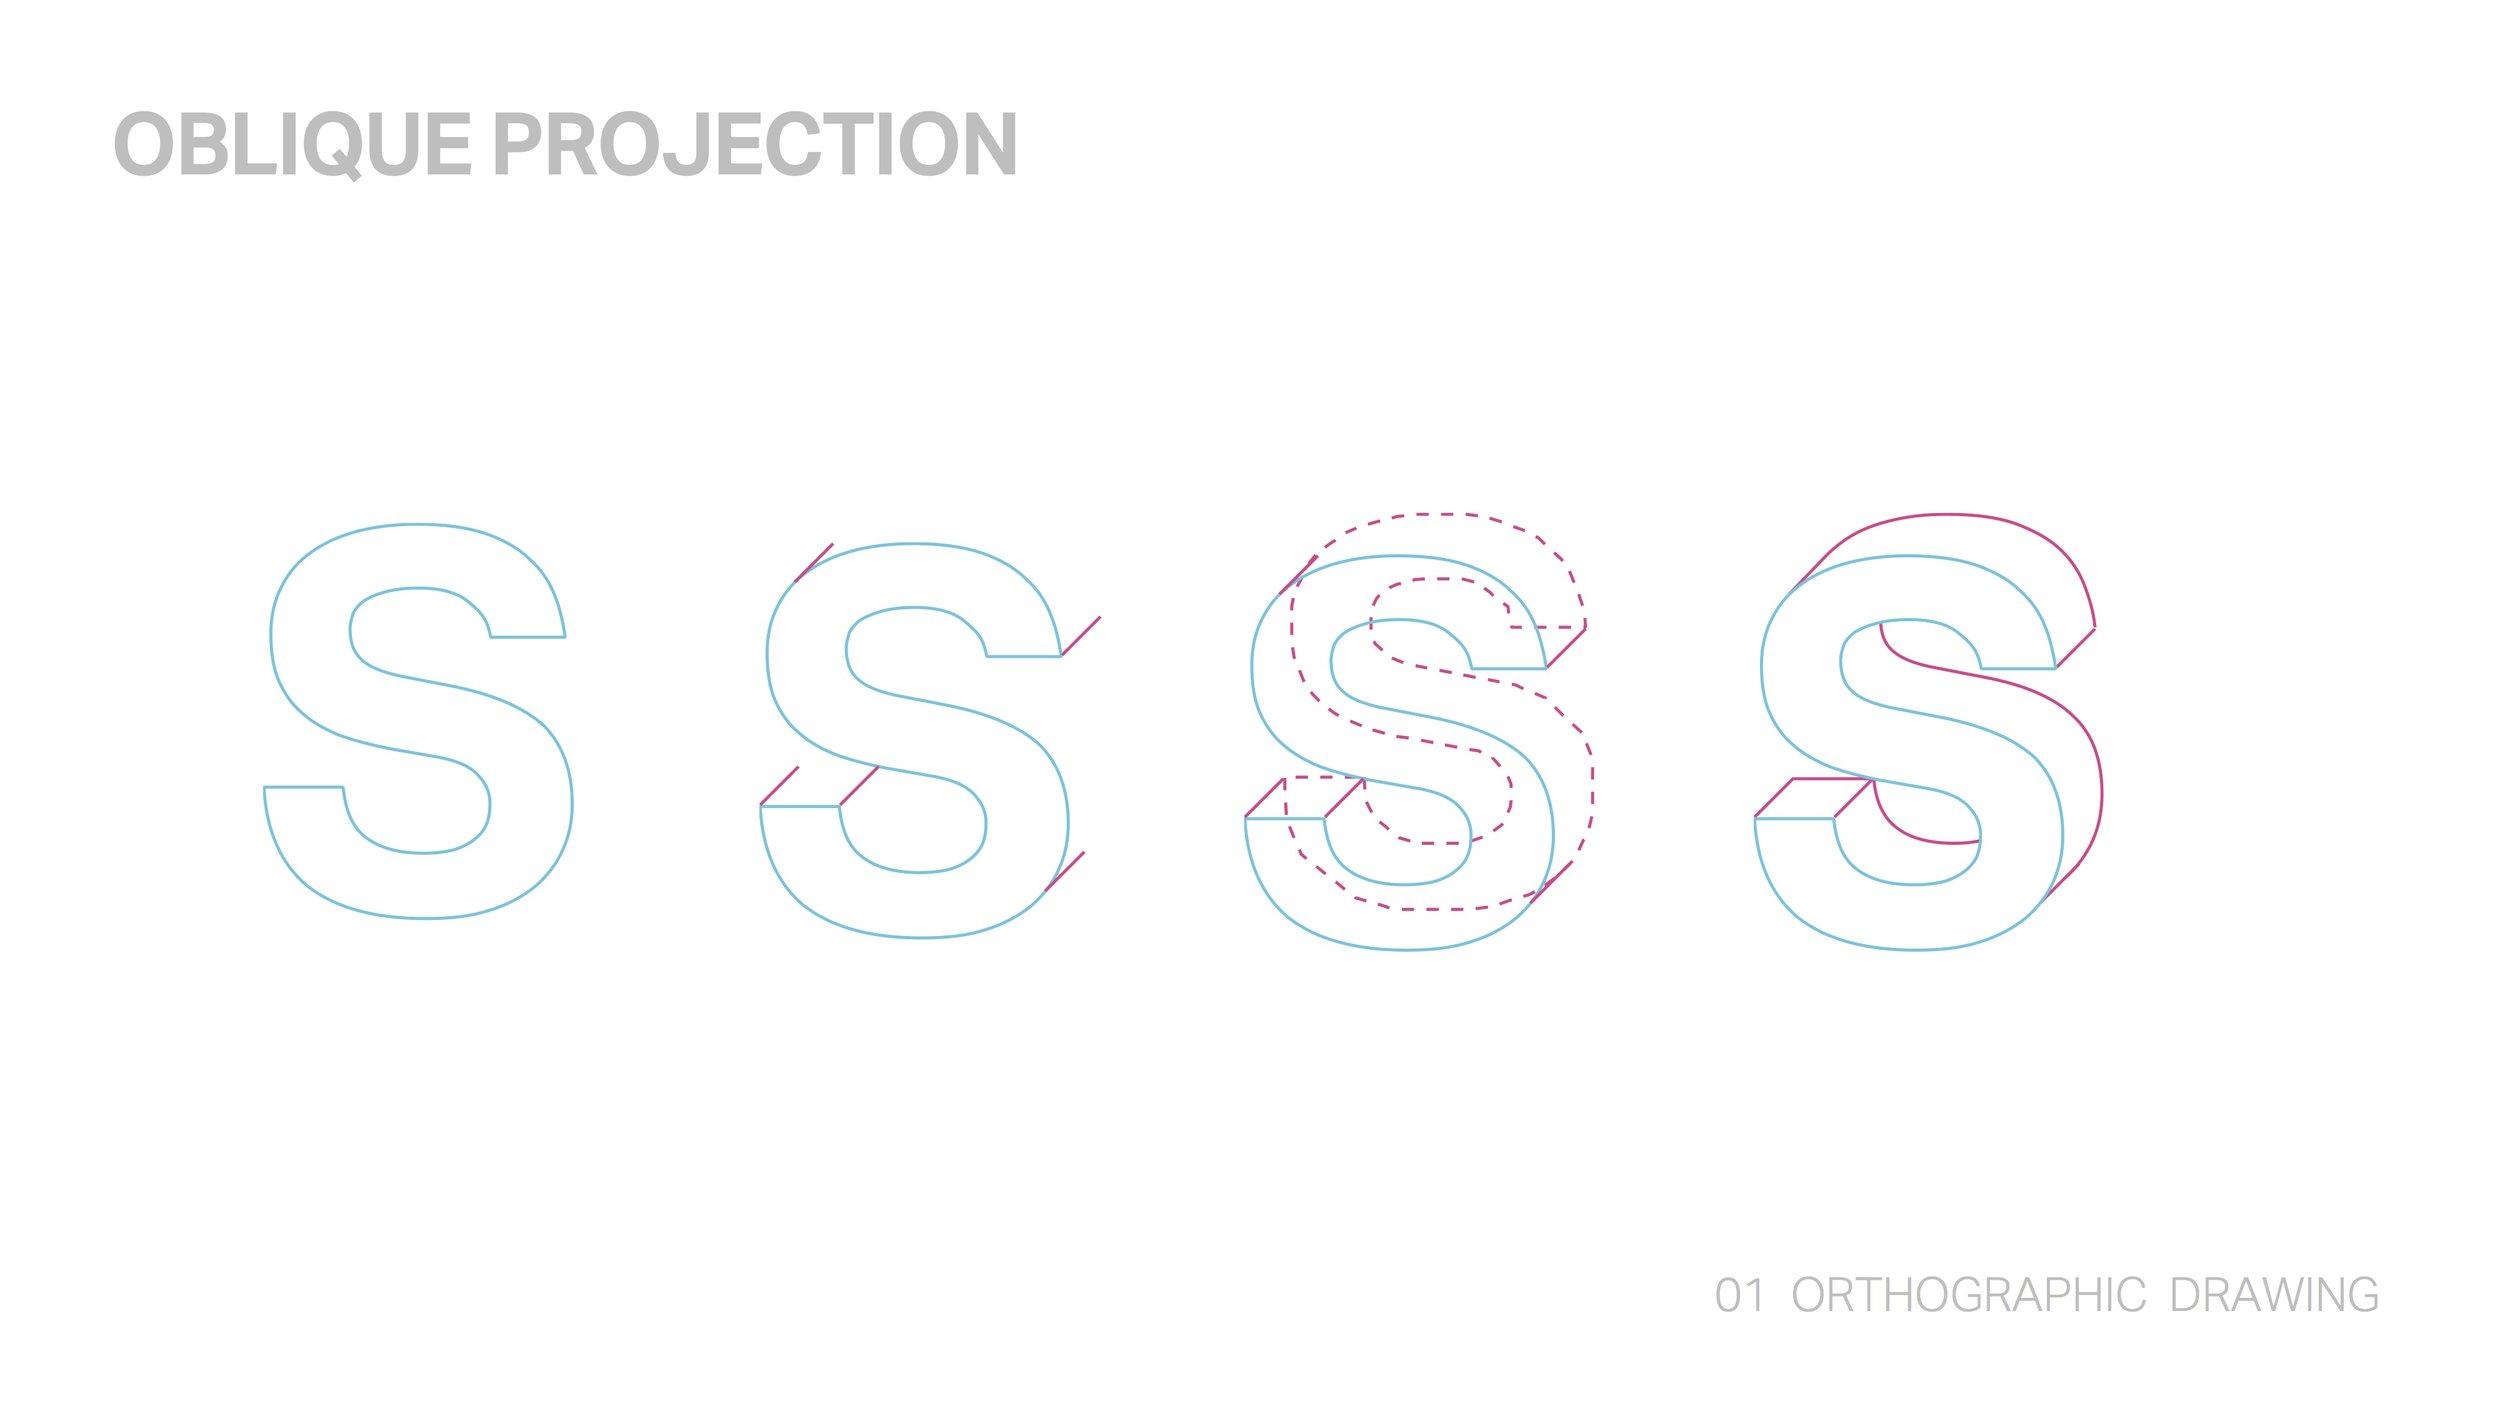 DrawingWorkshop_Presentation_07312015 (1)5.jpg